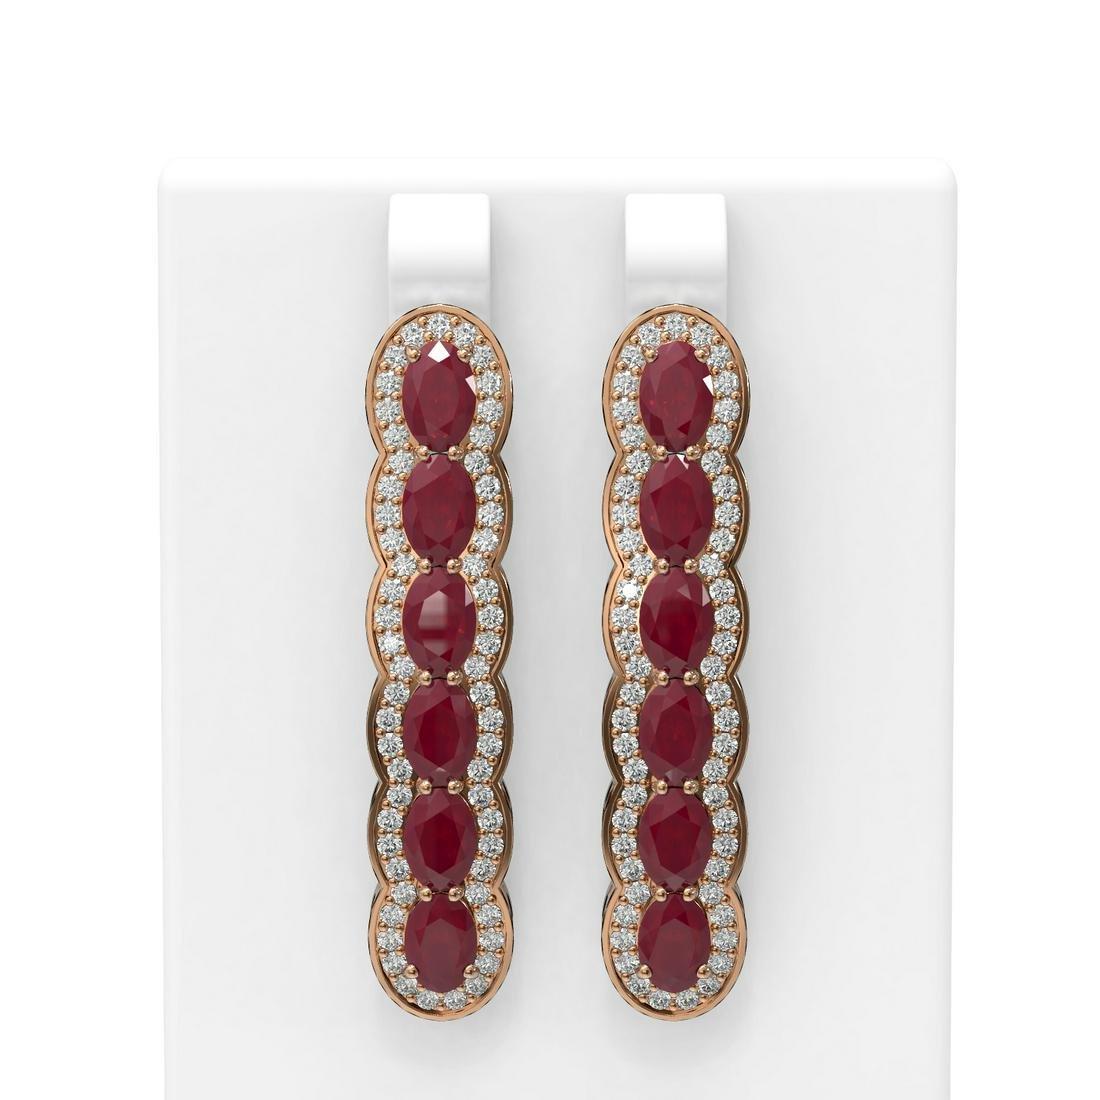 9.85 ctw Ruby & Diamond Earrings 18K Rose Gold -